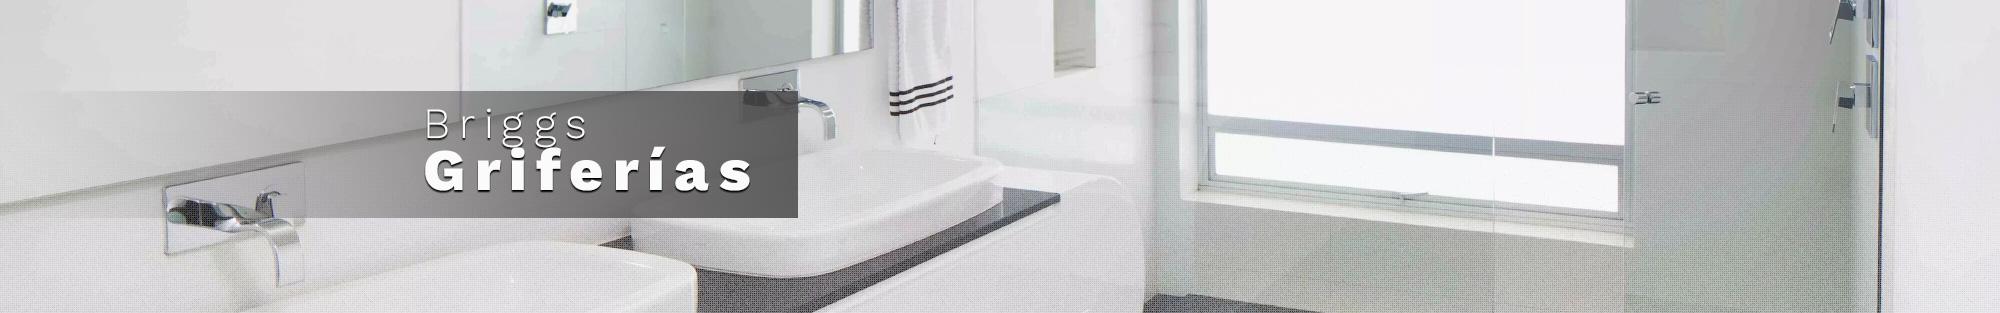 Categoría Griferías | Briggs - The Premium Bath Collection